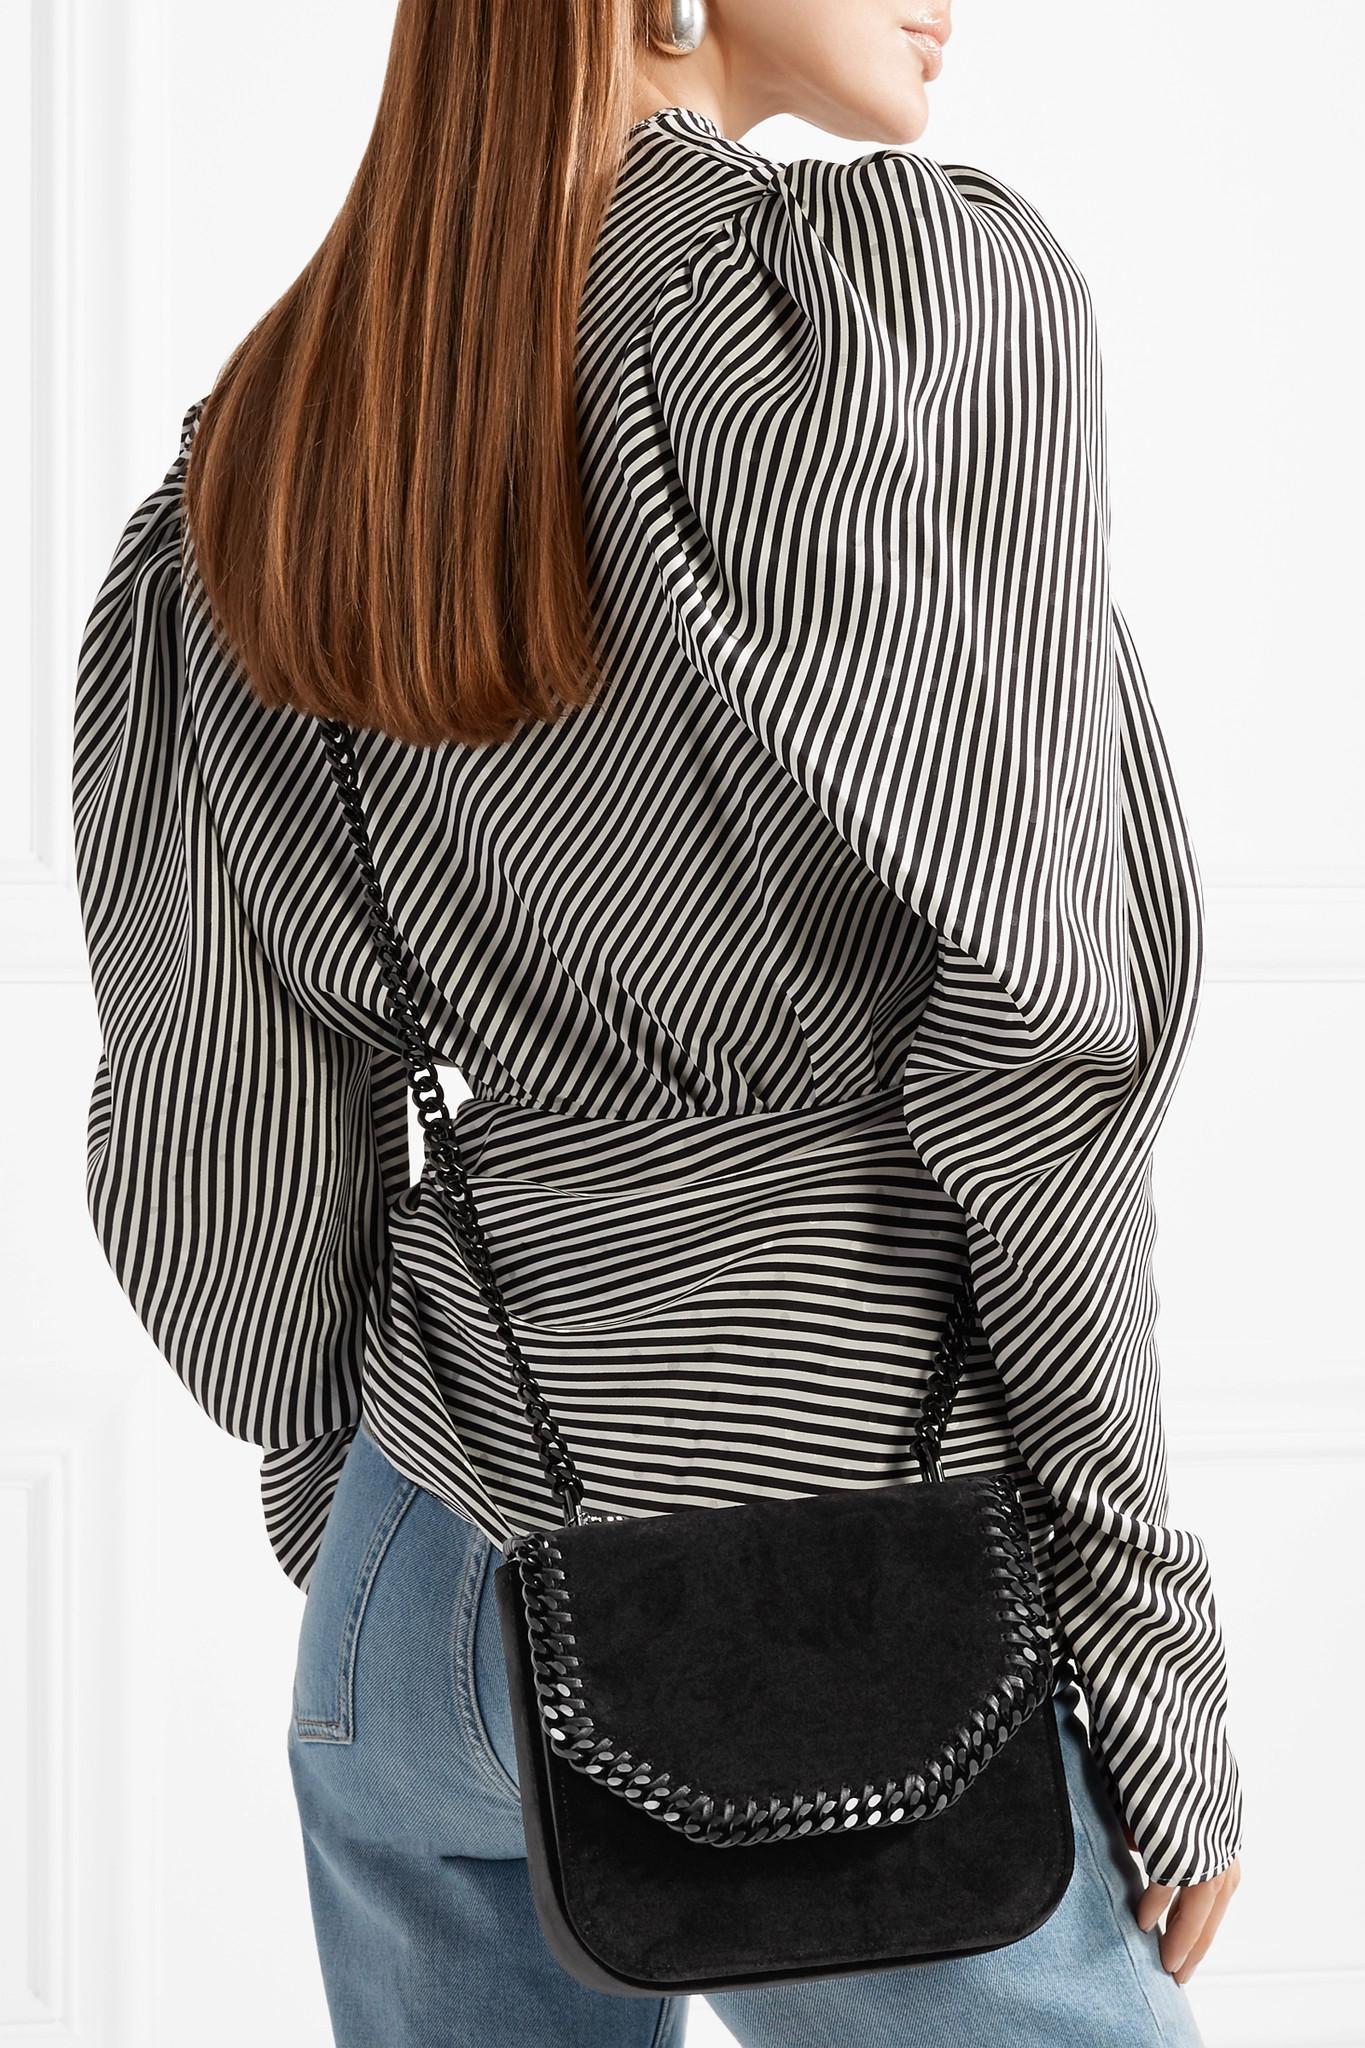 ef0e70fe40 Lyst - Stella McCartney The Falabella Box Medium Velvet Shoulder Bag ...